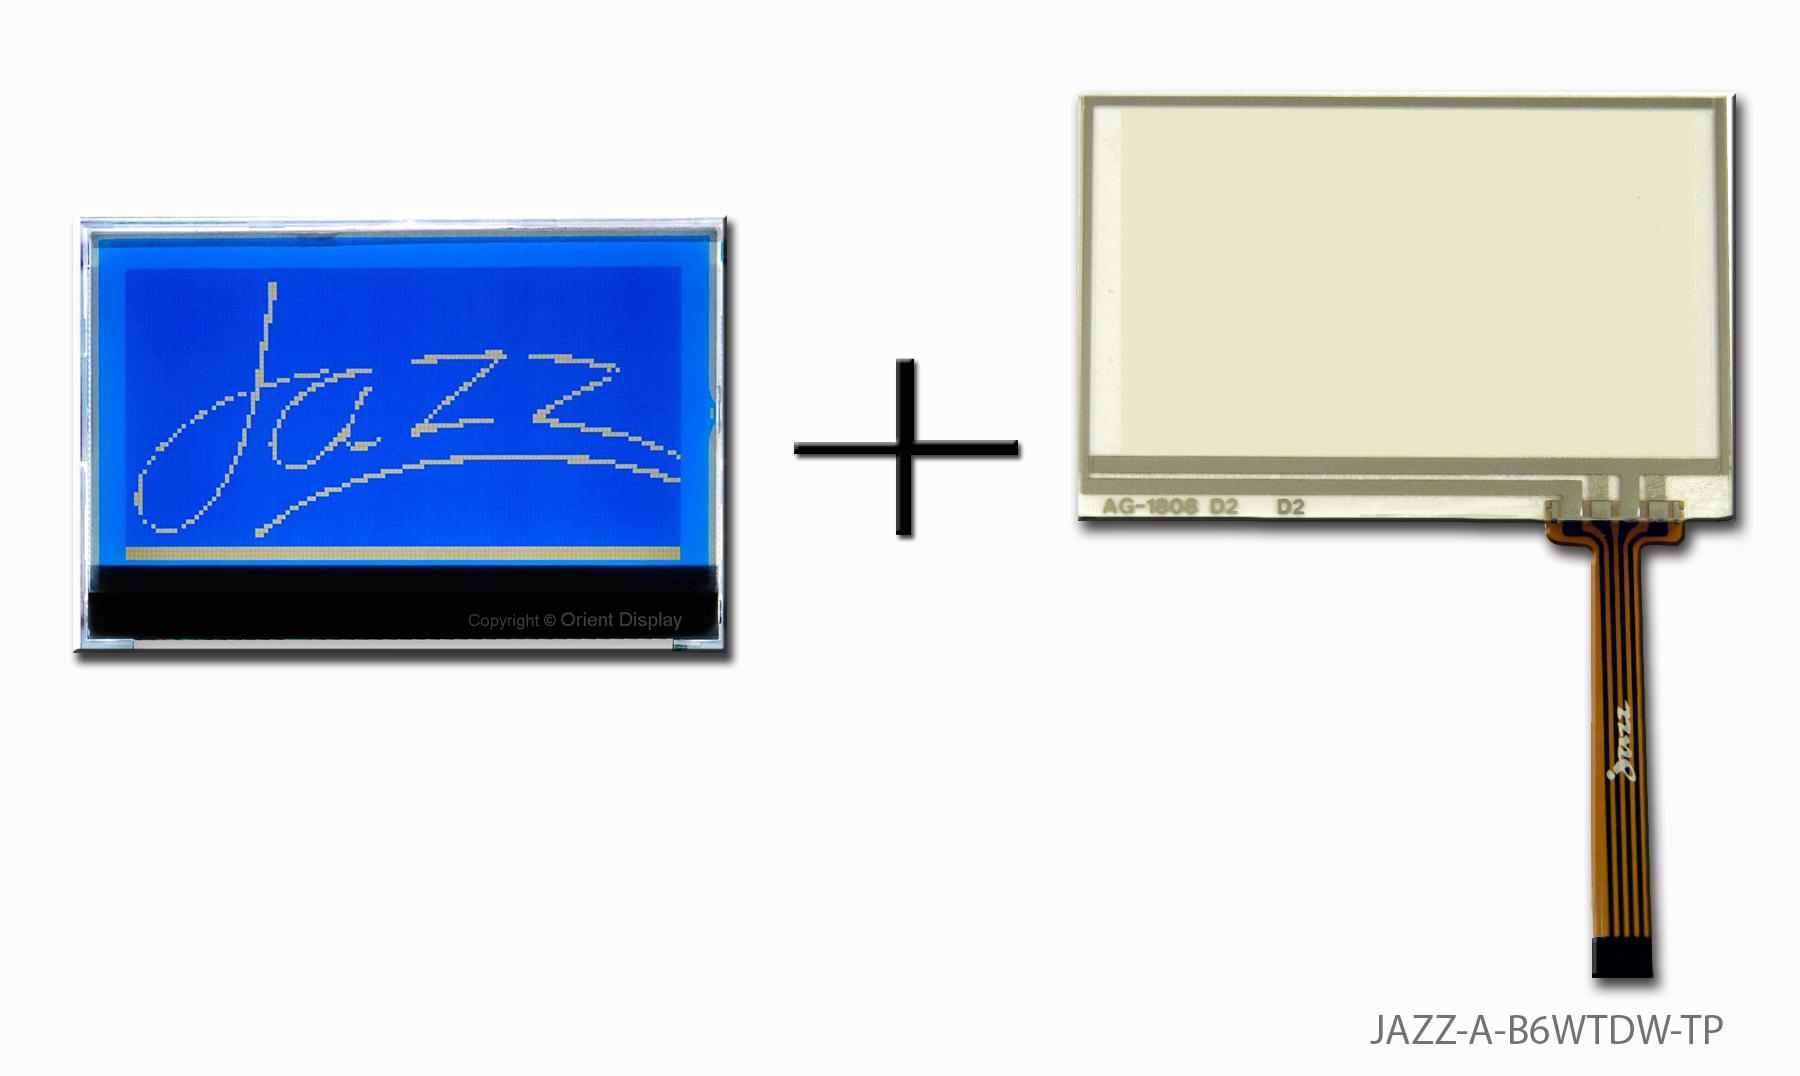 JAZZ-A-B6WTDW-TP (LCD+BL+RTP, Graphic COG 128x64)